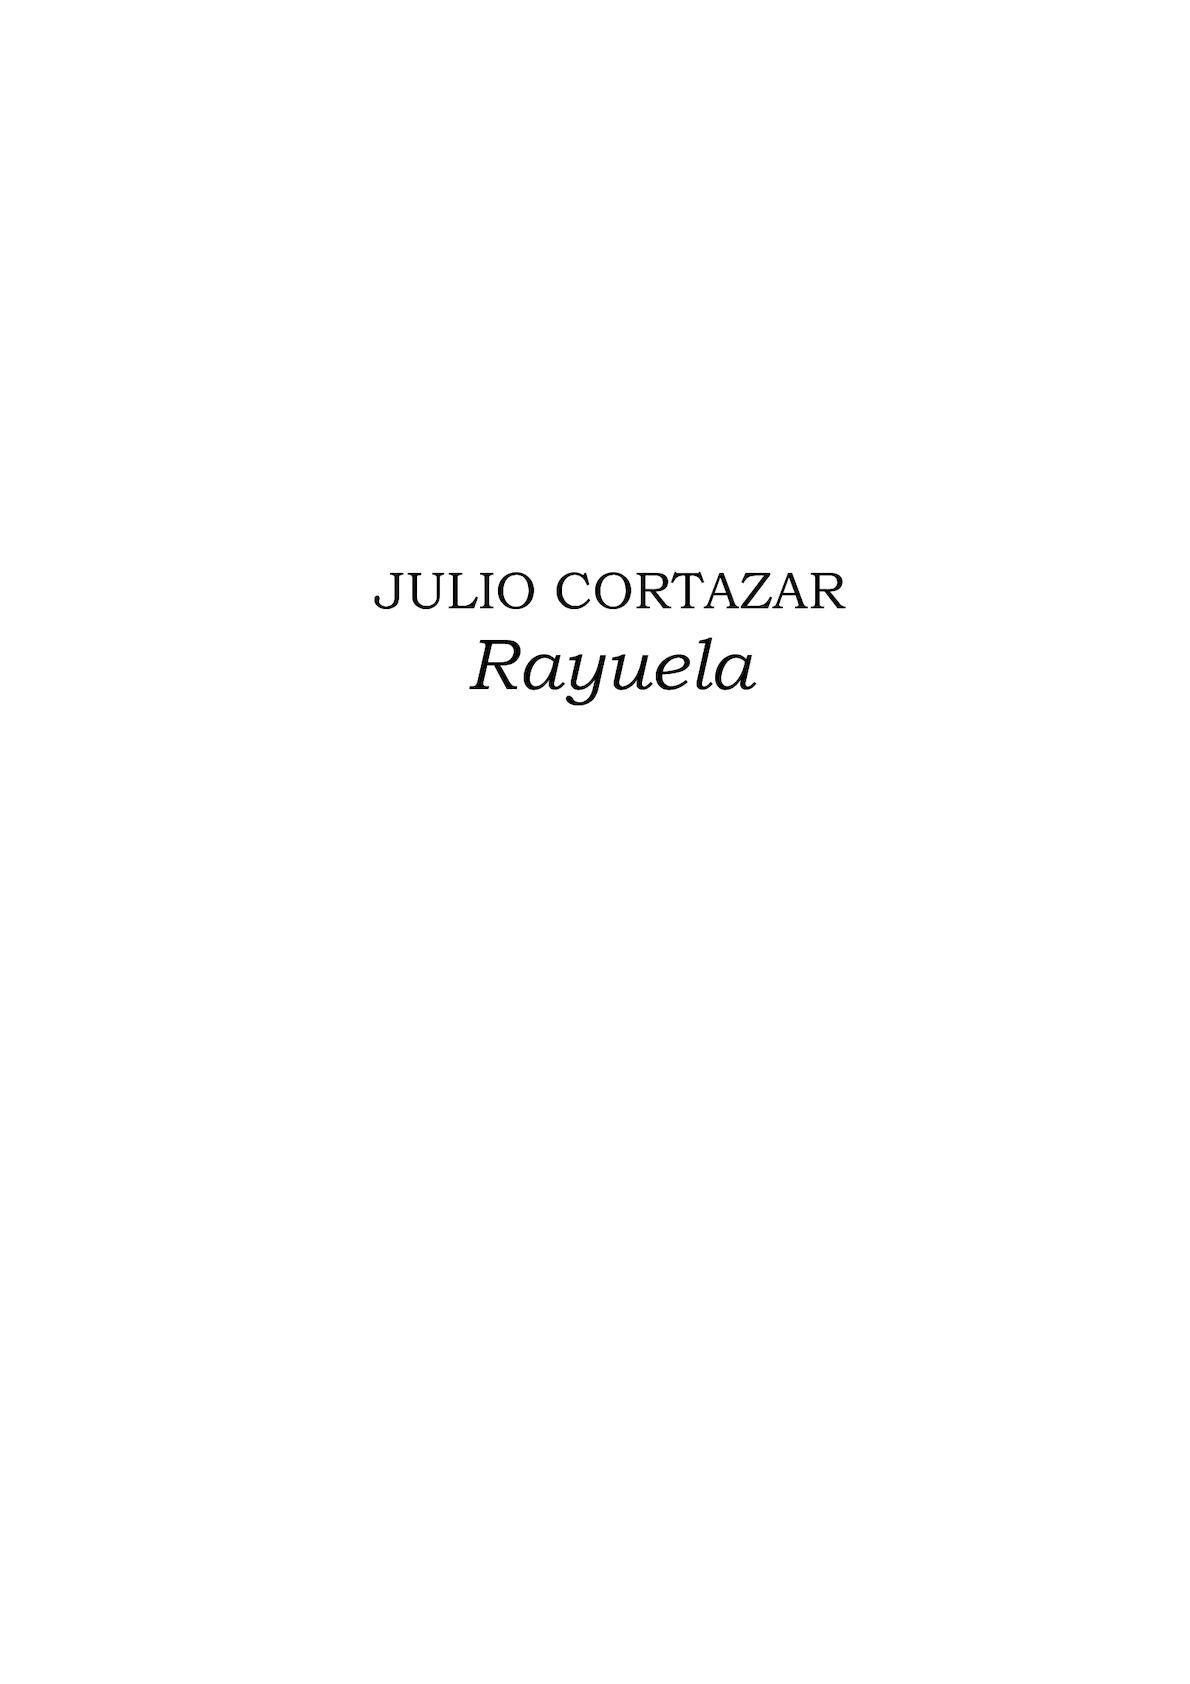 ab137f260 Calaméo - Rayuela Cortazar Julio